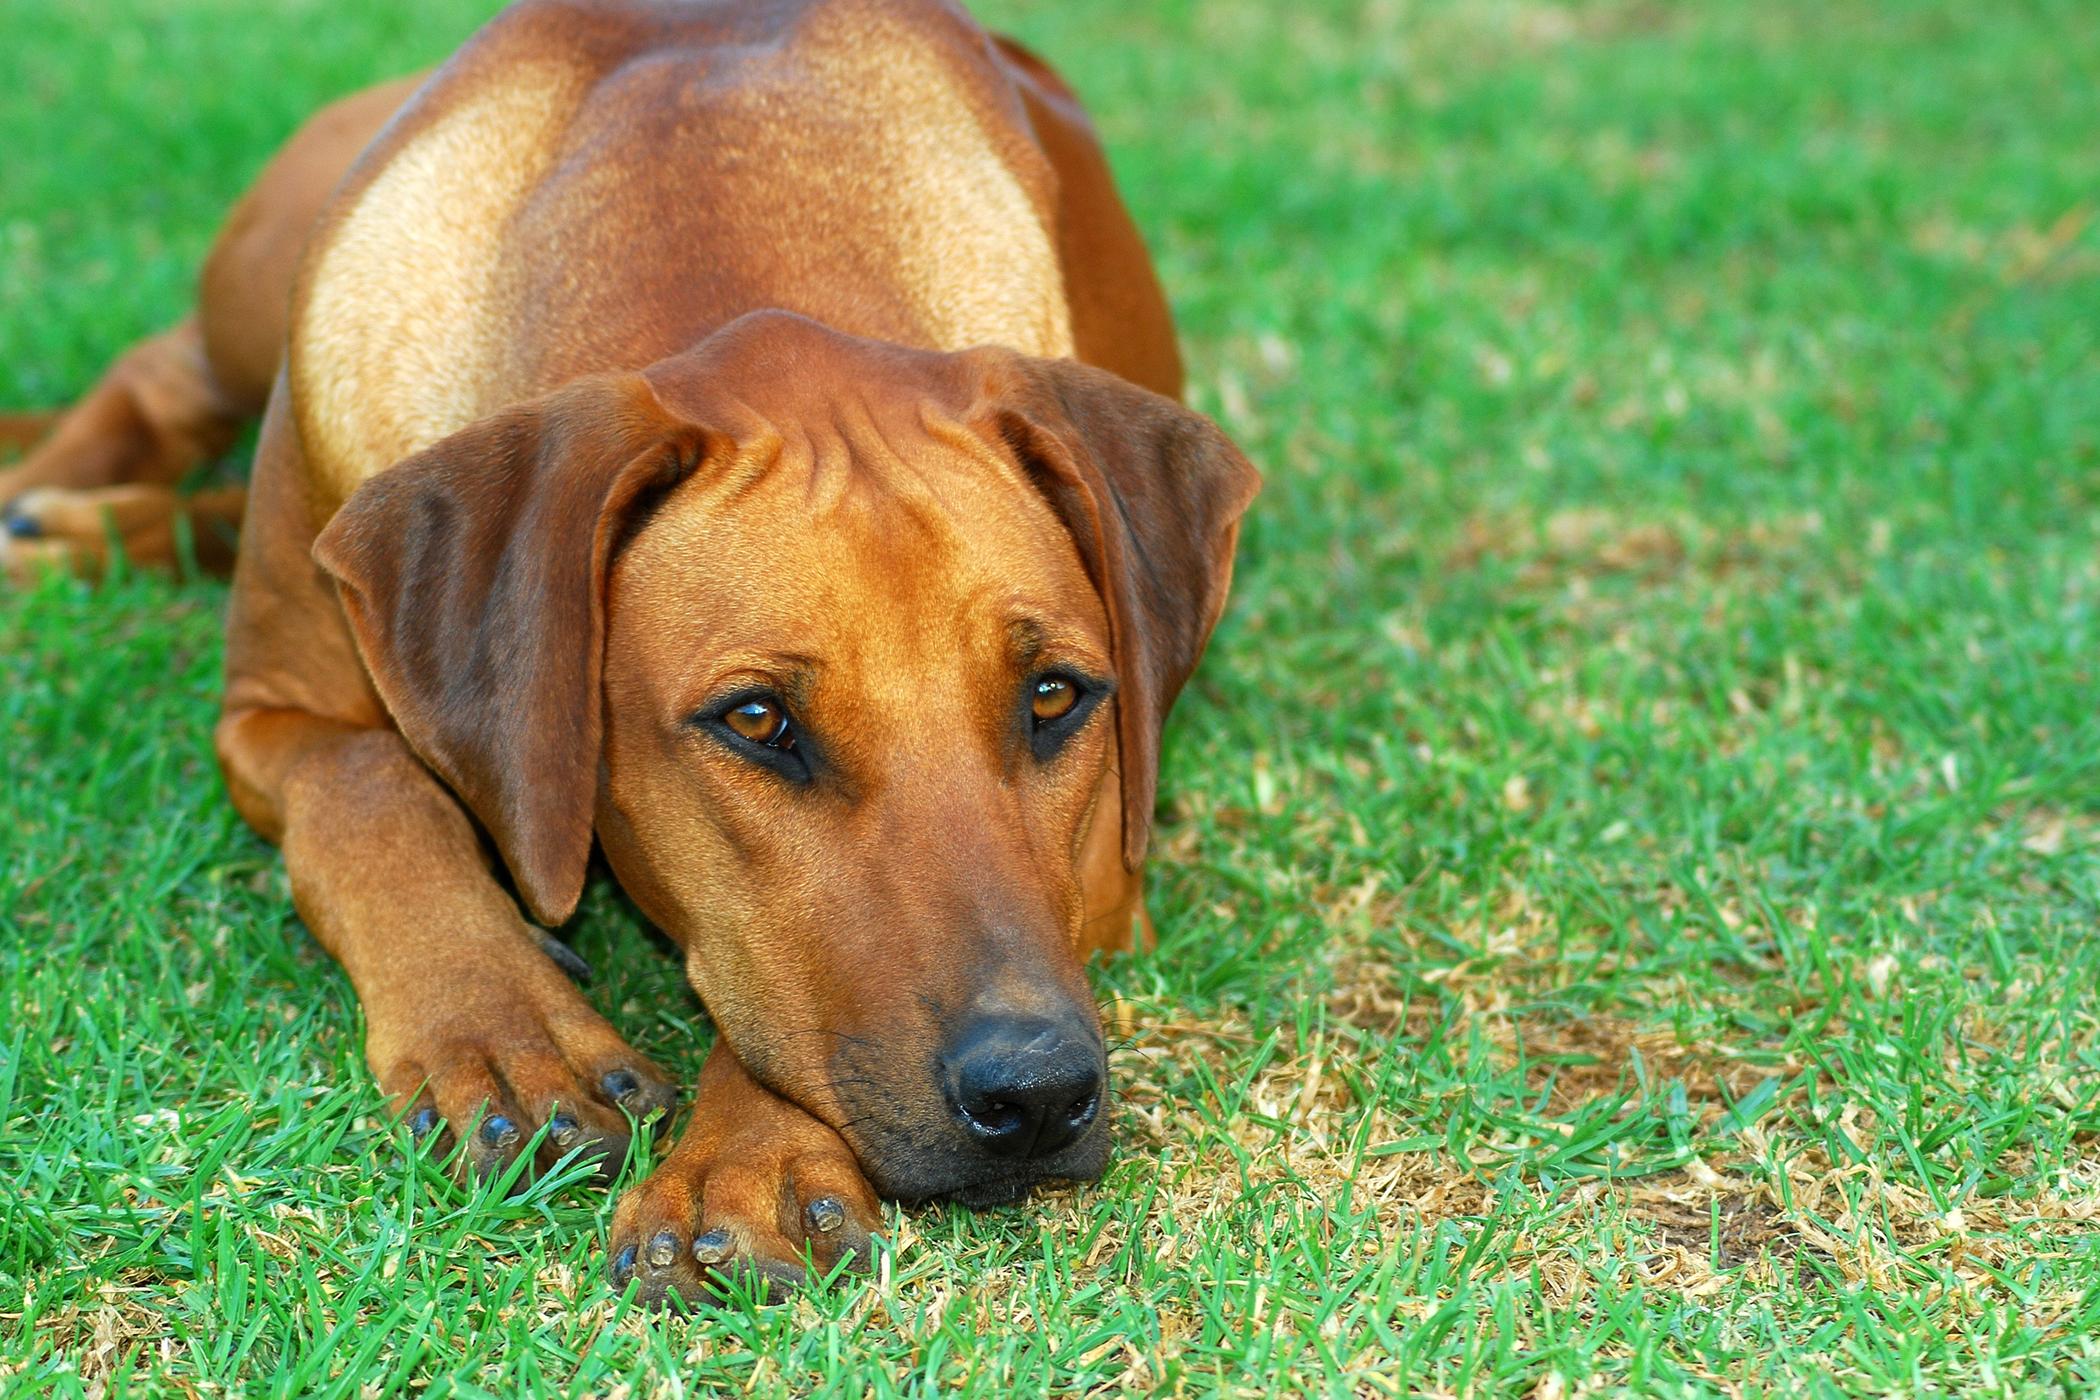 Urethrotomy in Dogs